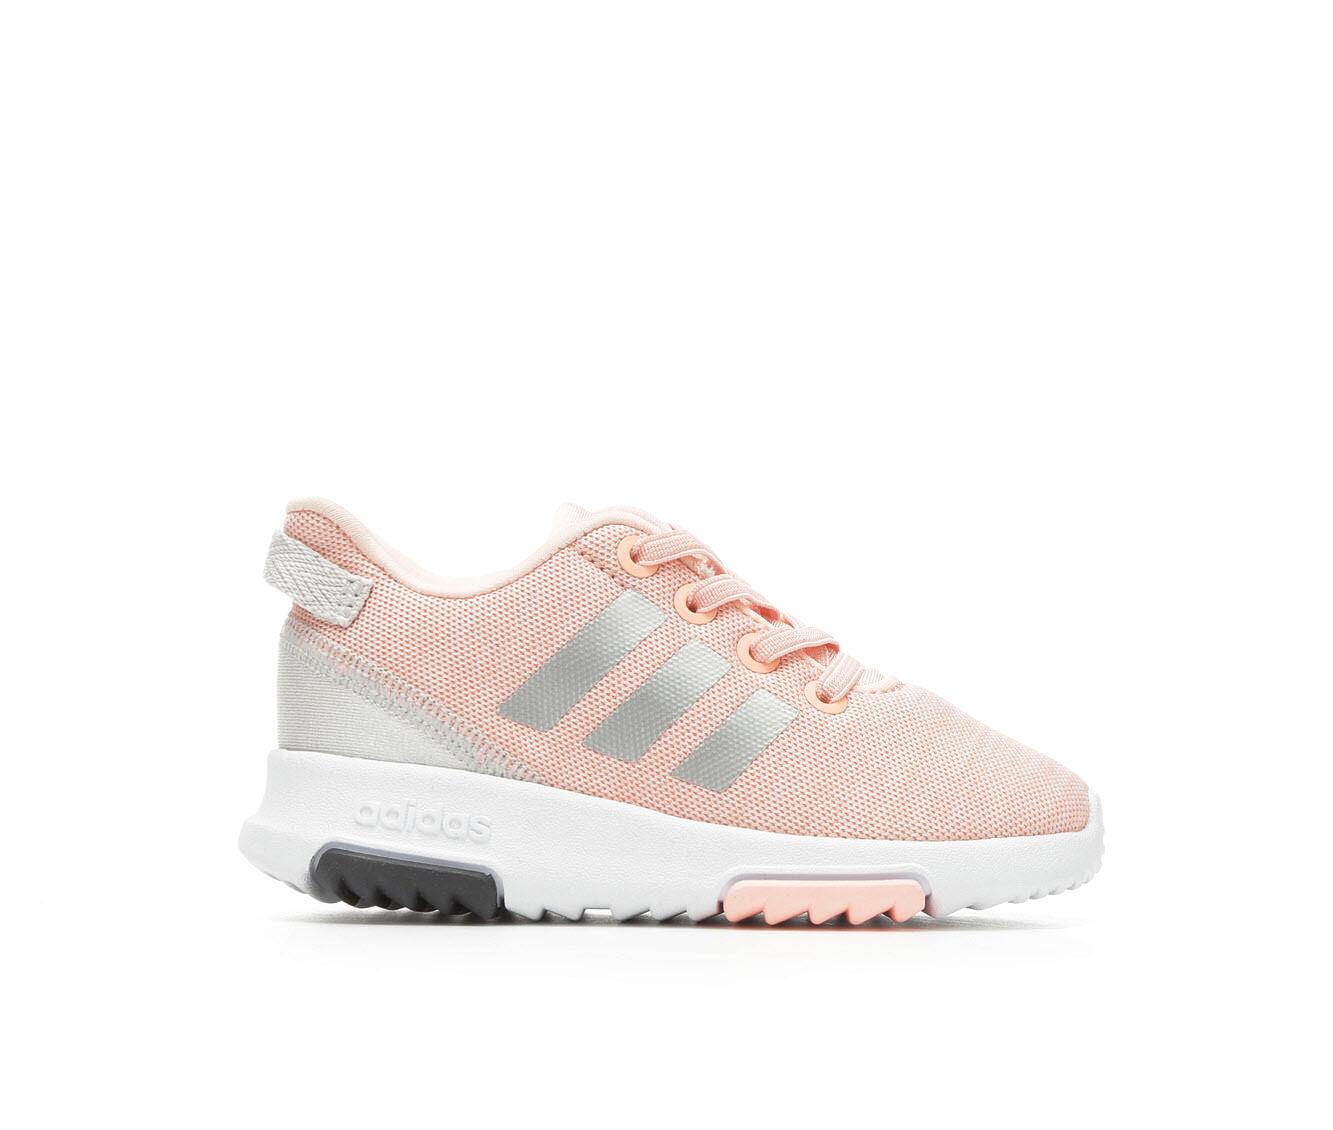 Girls\u0027 Adidas Infant \u0026 Toddler Racer TR Athletic Shoes